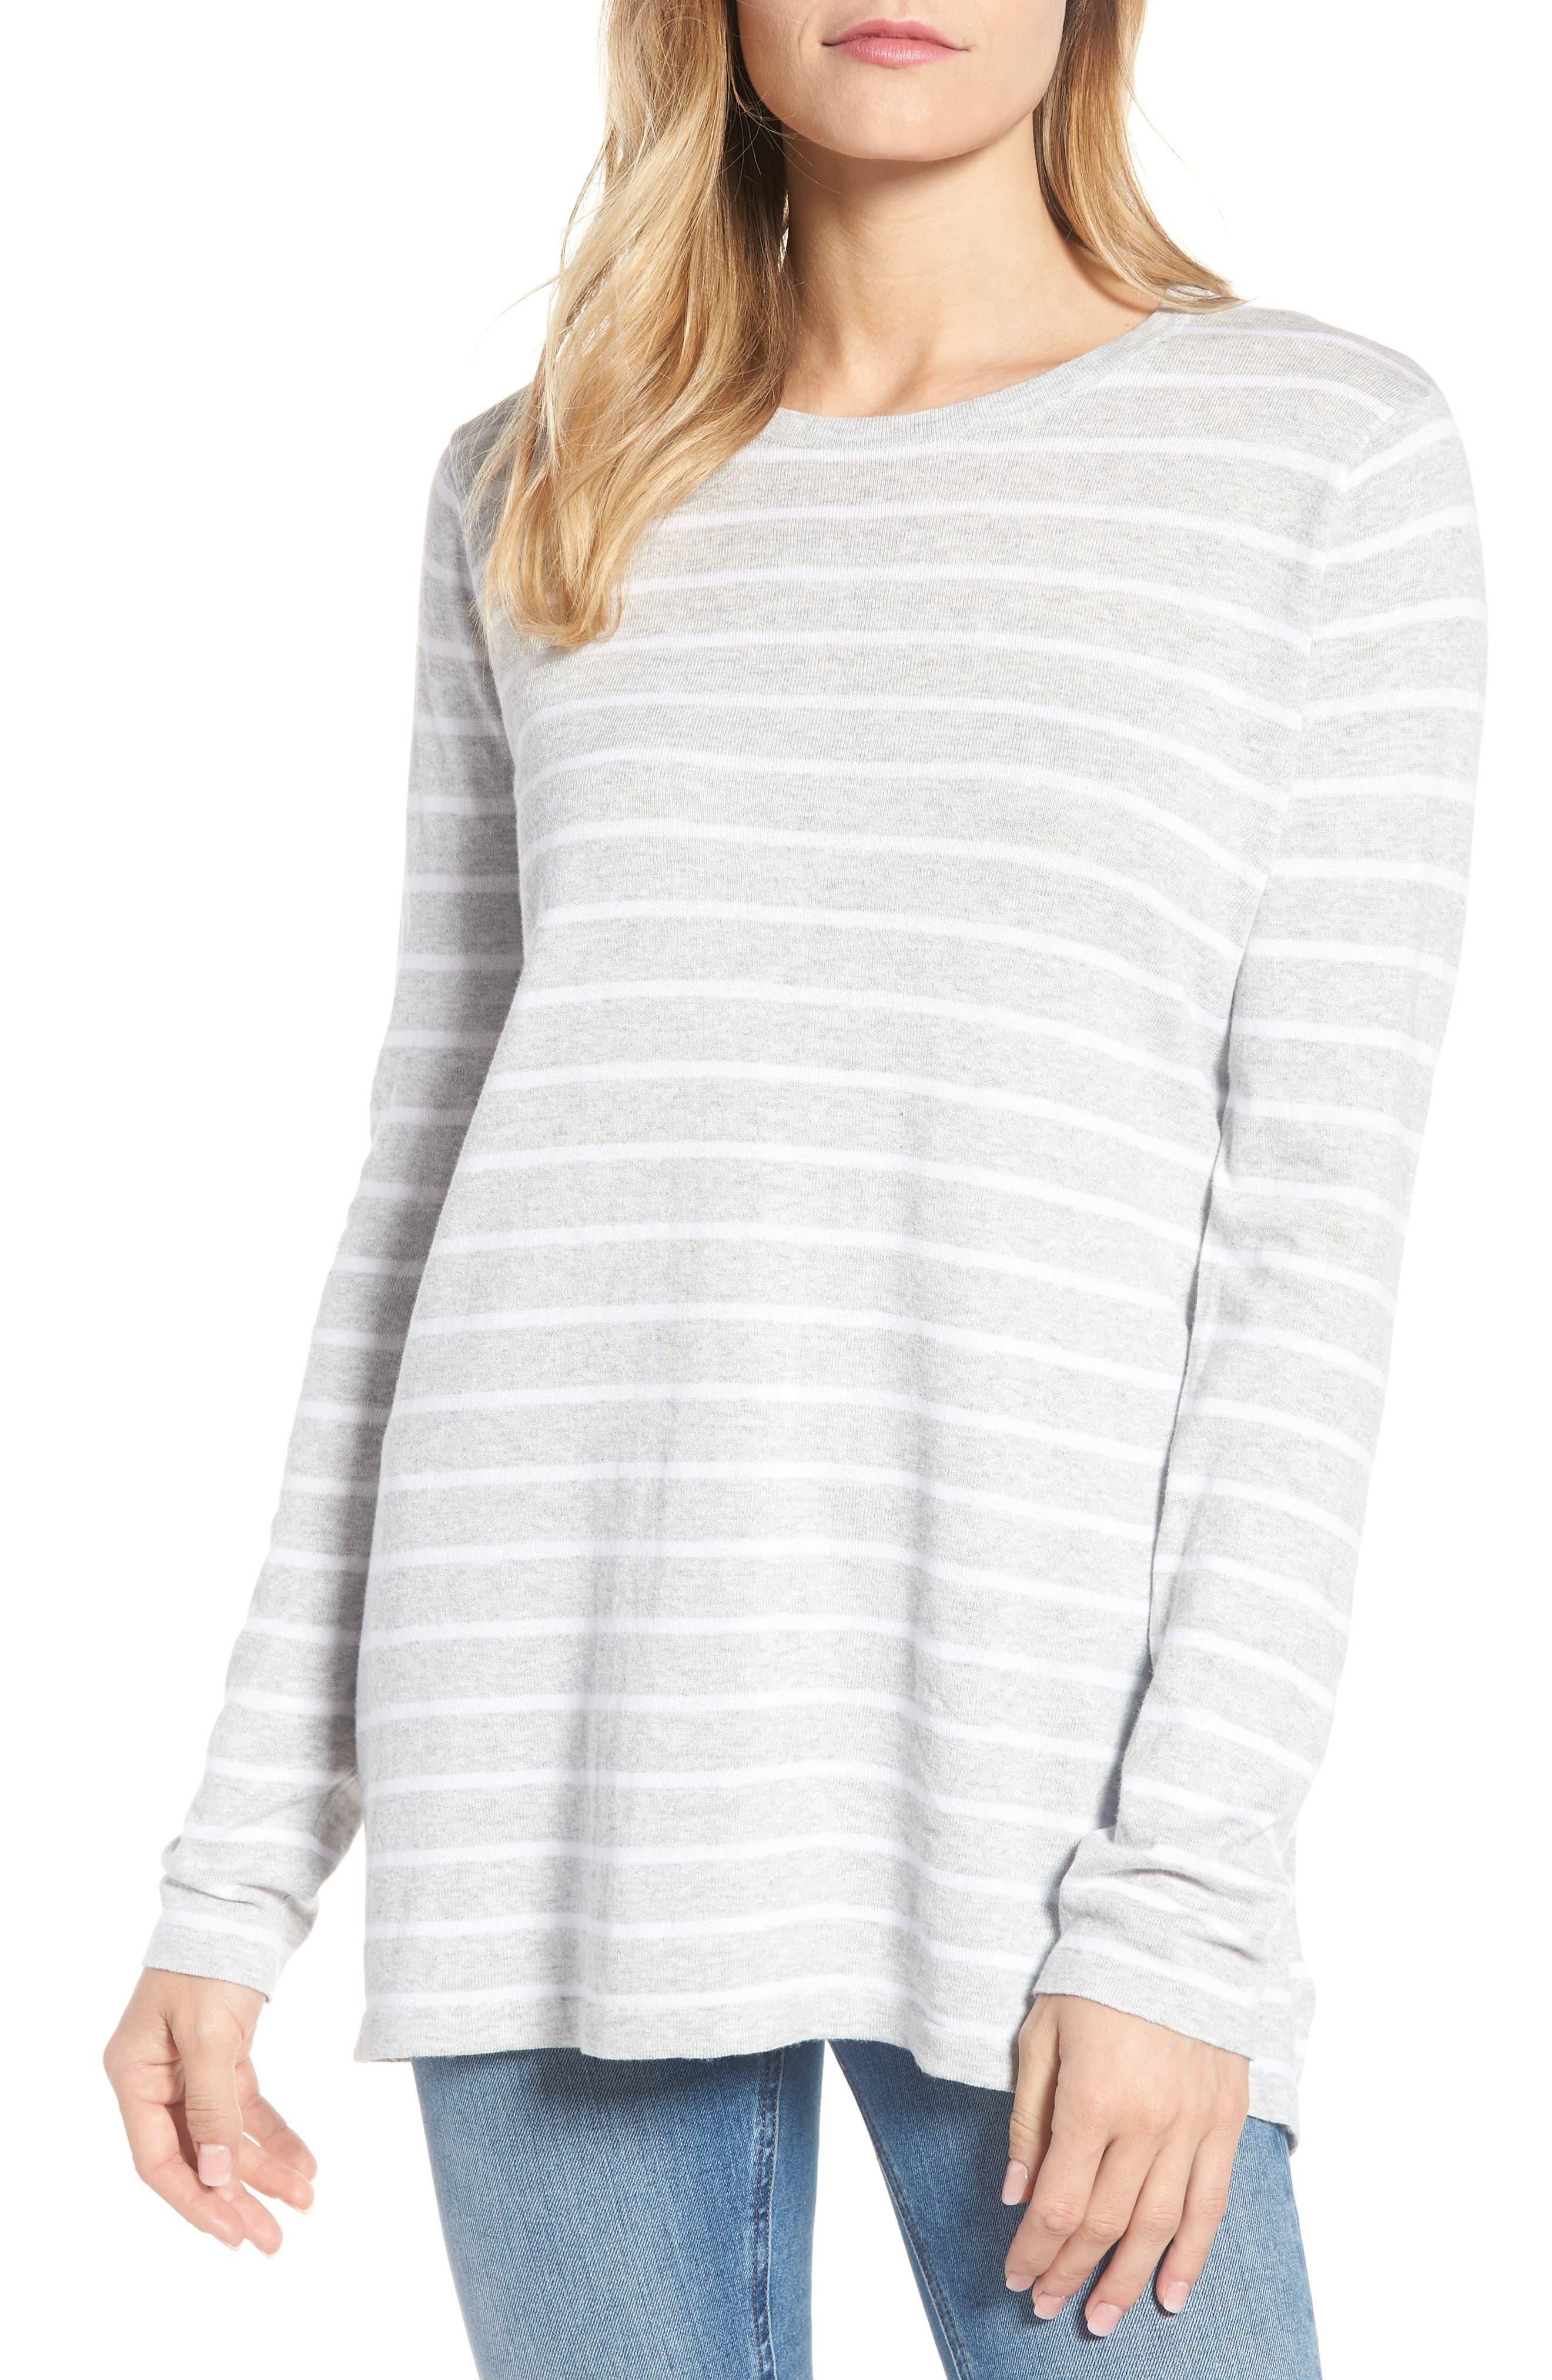 Cotton Blend Stripe Trapeze Cotton Blend Sweater,                             Main thumbnail 1, color,                             Pebble Grey Mix Warm White